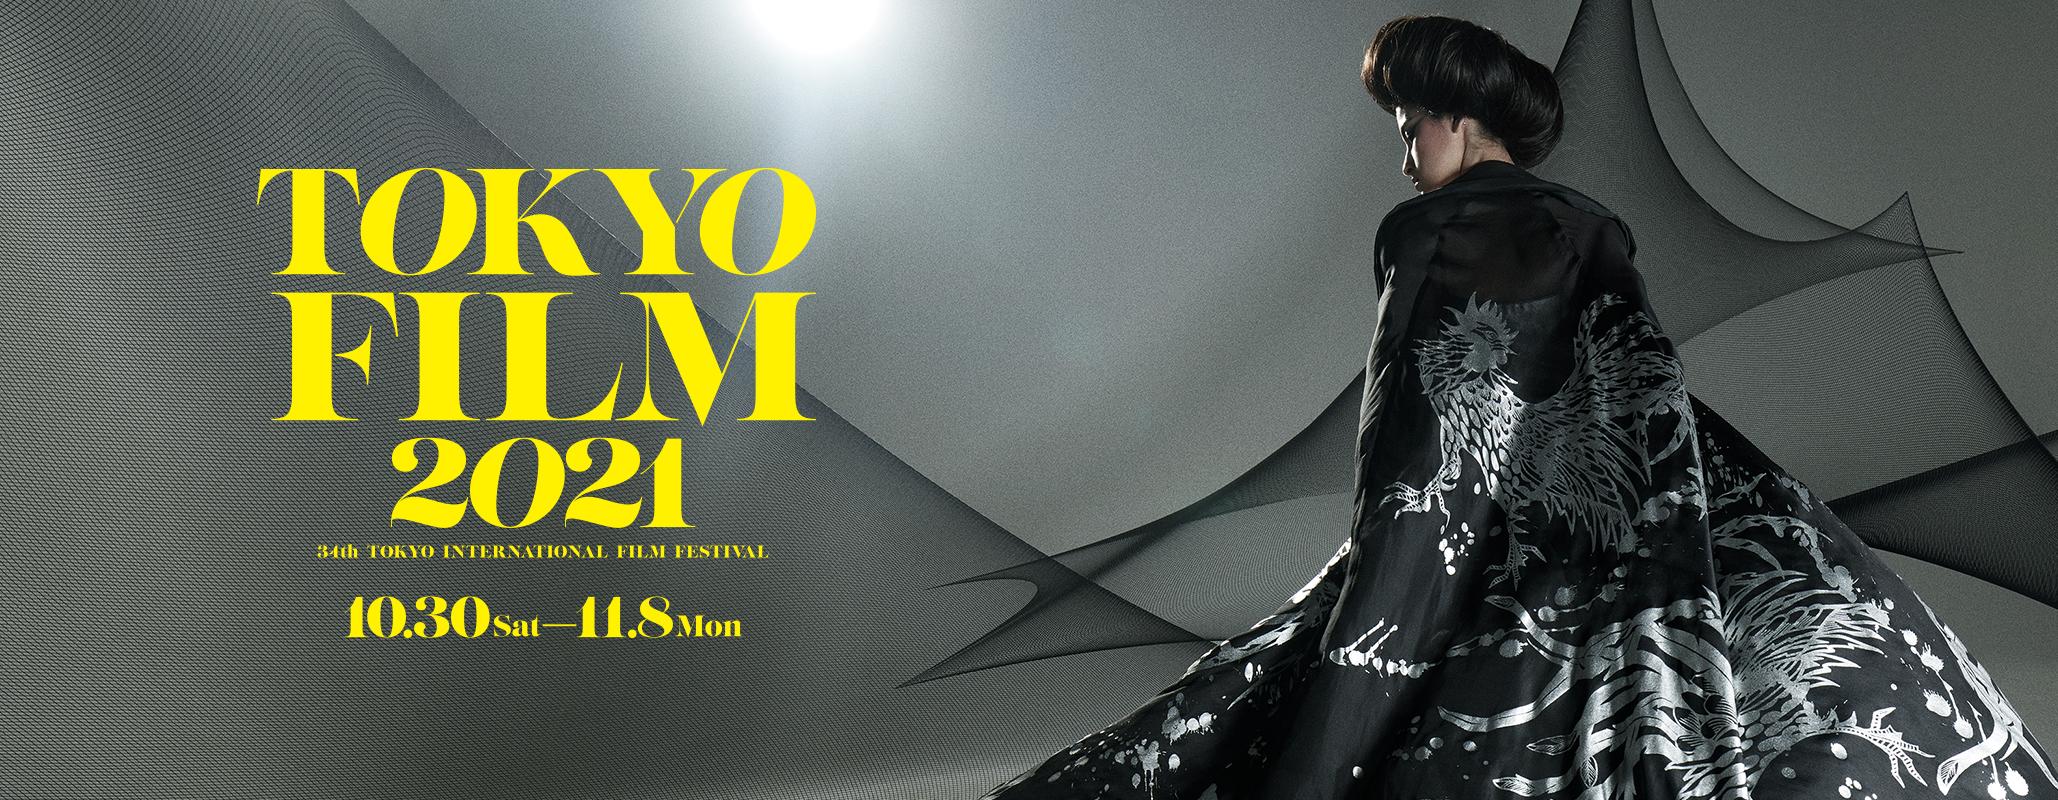 TOKYO FILM 2021 第34回東京国際映画祭 ビジュアル監修コシノジュンコ